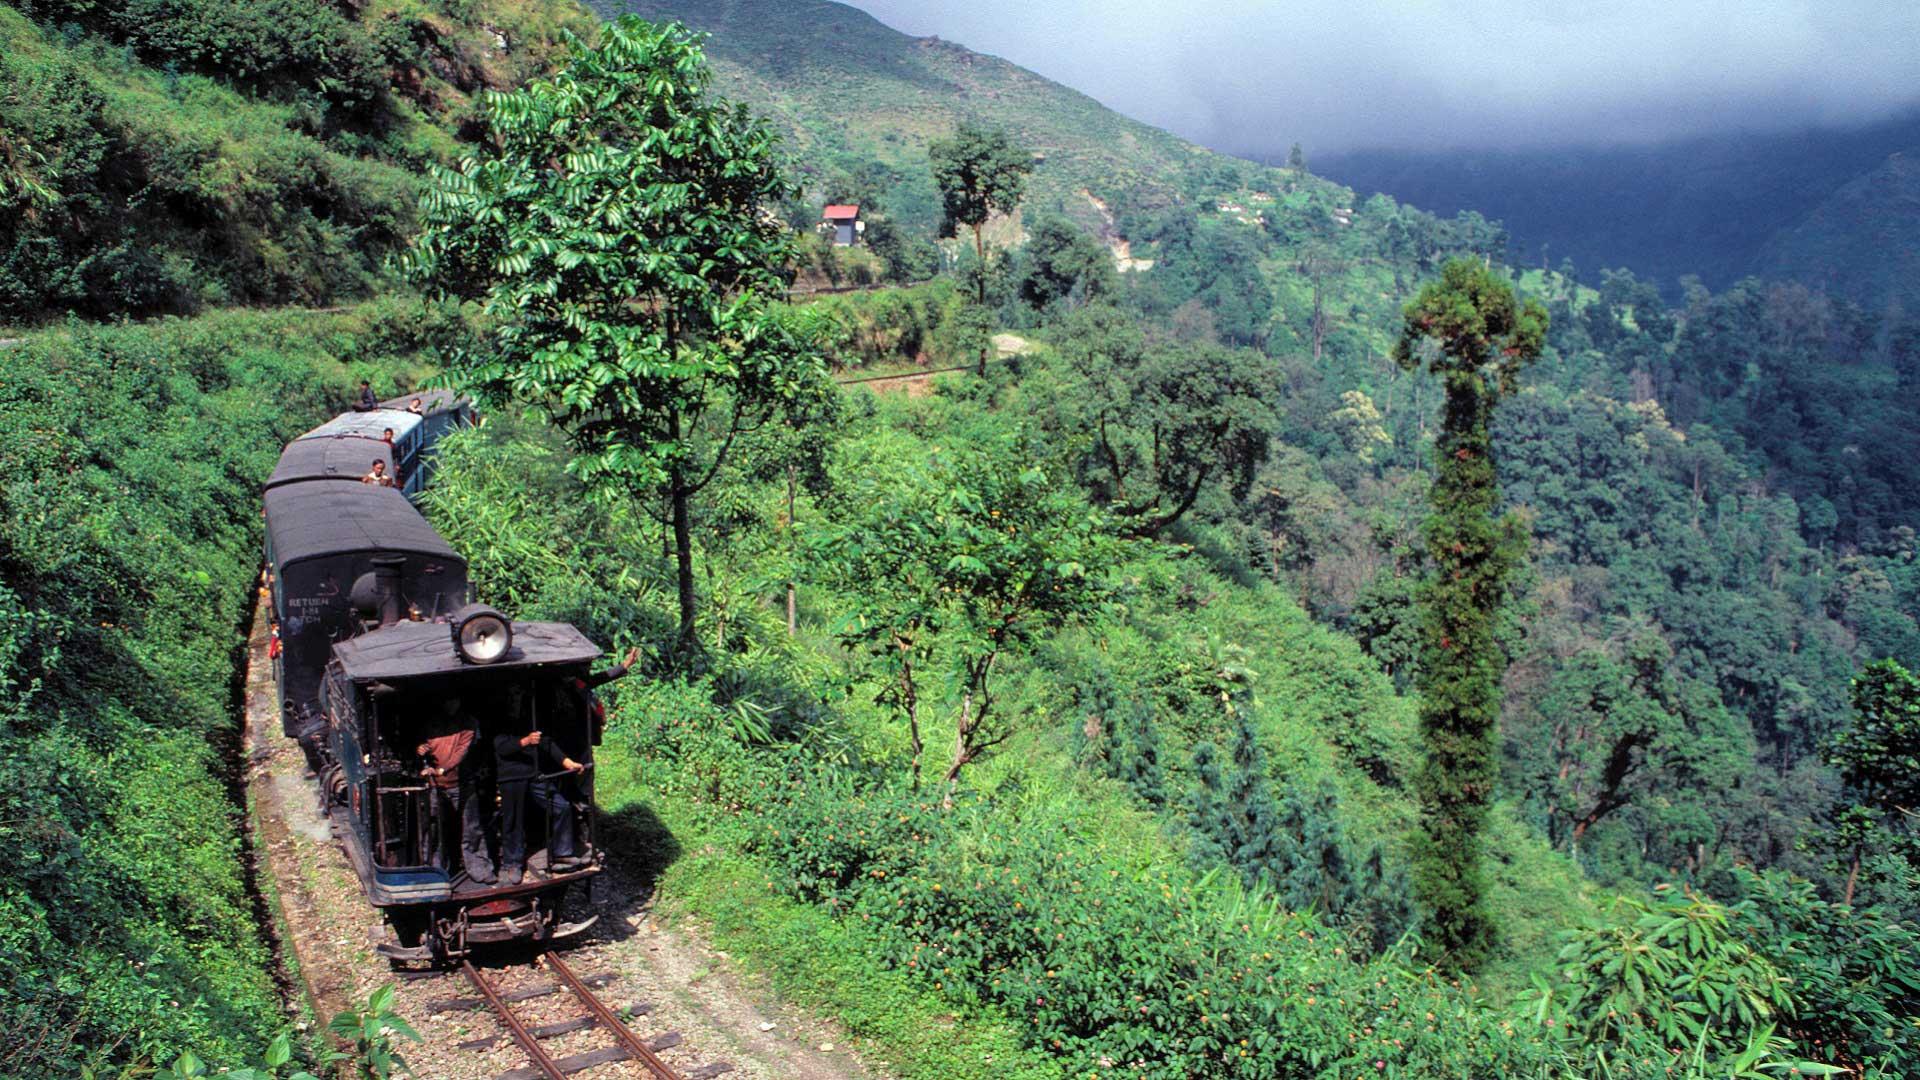 The Darjeeling Himalayan Railway, a World Heritage Site, cuts through the lush hillsides of Darjeeling, India with GeoEx.